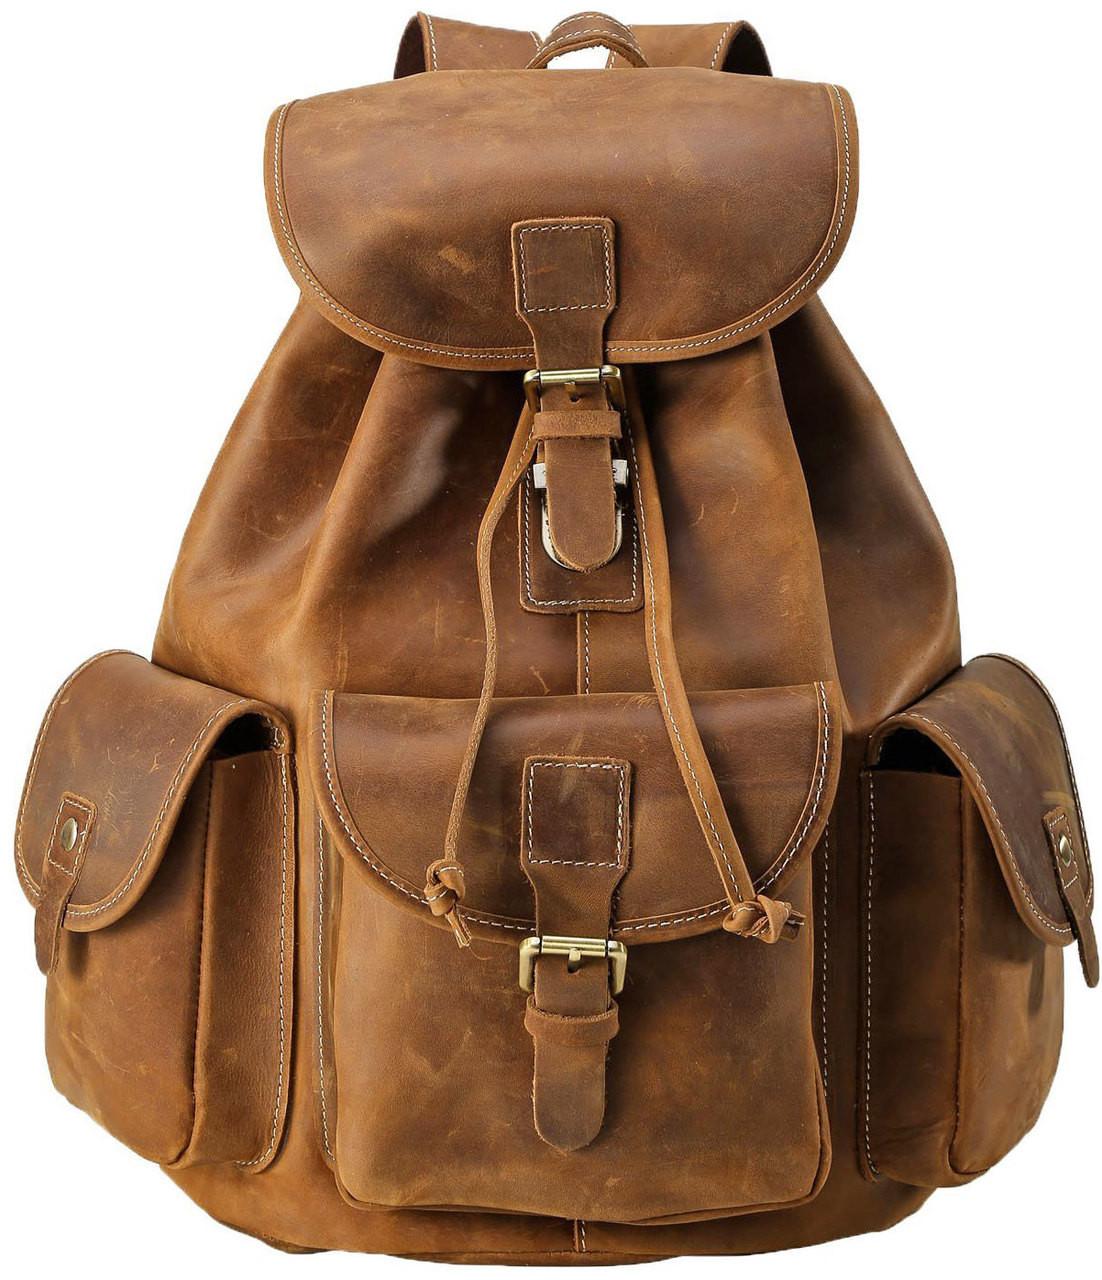 Pratt Leather Vintage Leather Backpack (Vintage Mocha) 15ed0d8e5e47